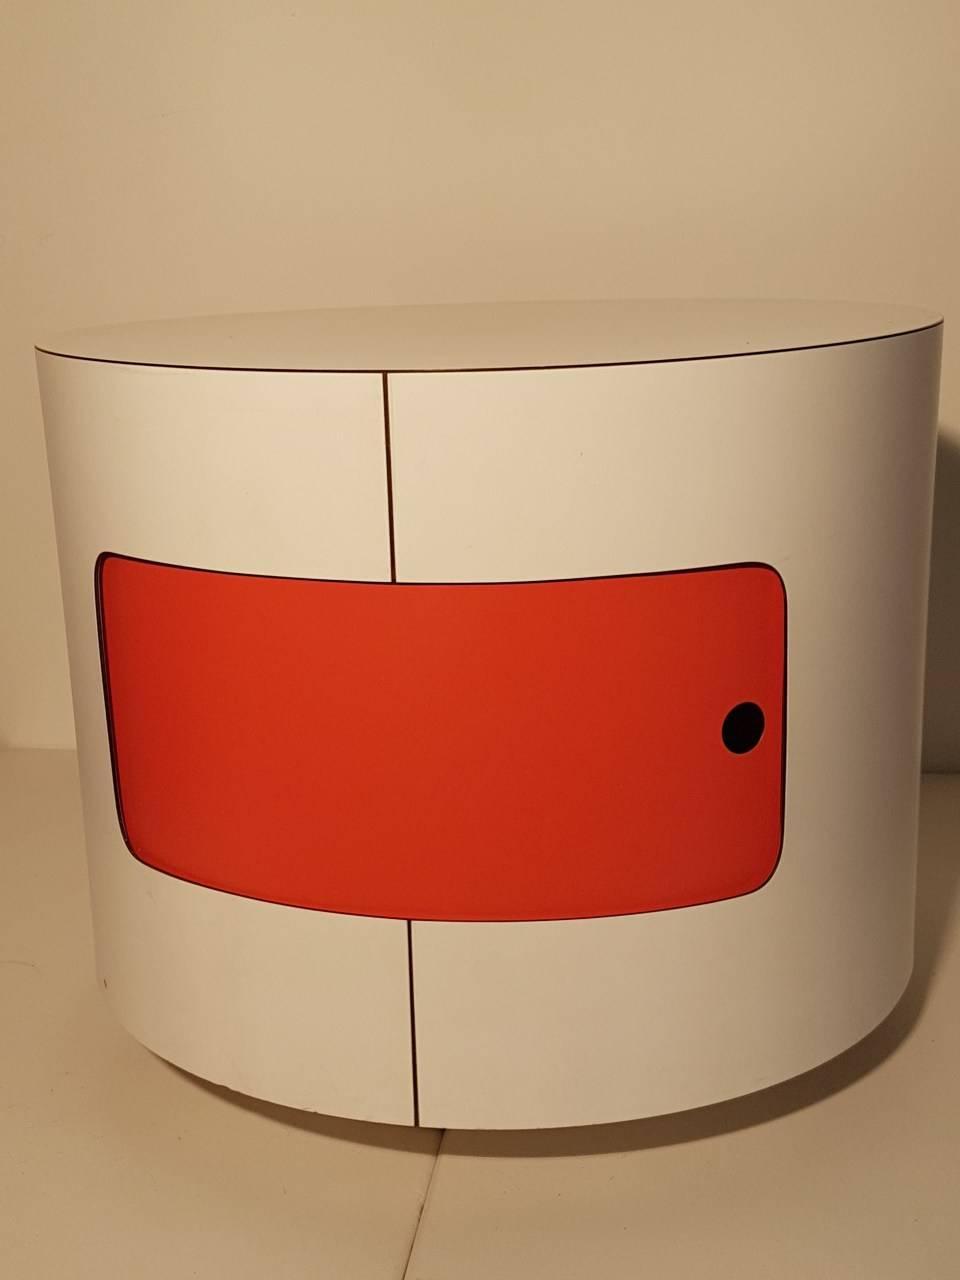 table de nuit italienne ronde de 1970 benoit de moffarts. Black Bedroom Furniture Sets. Home Design Ideas